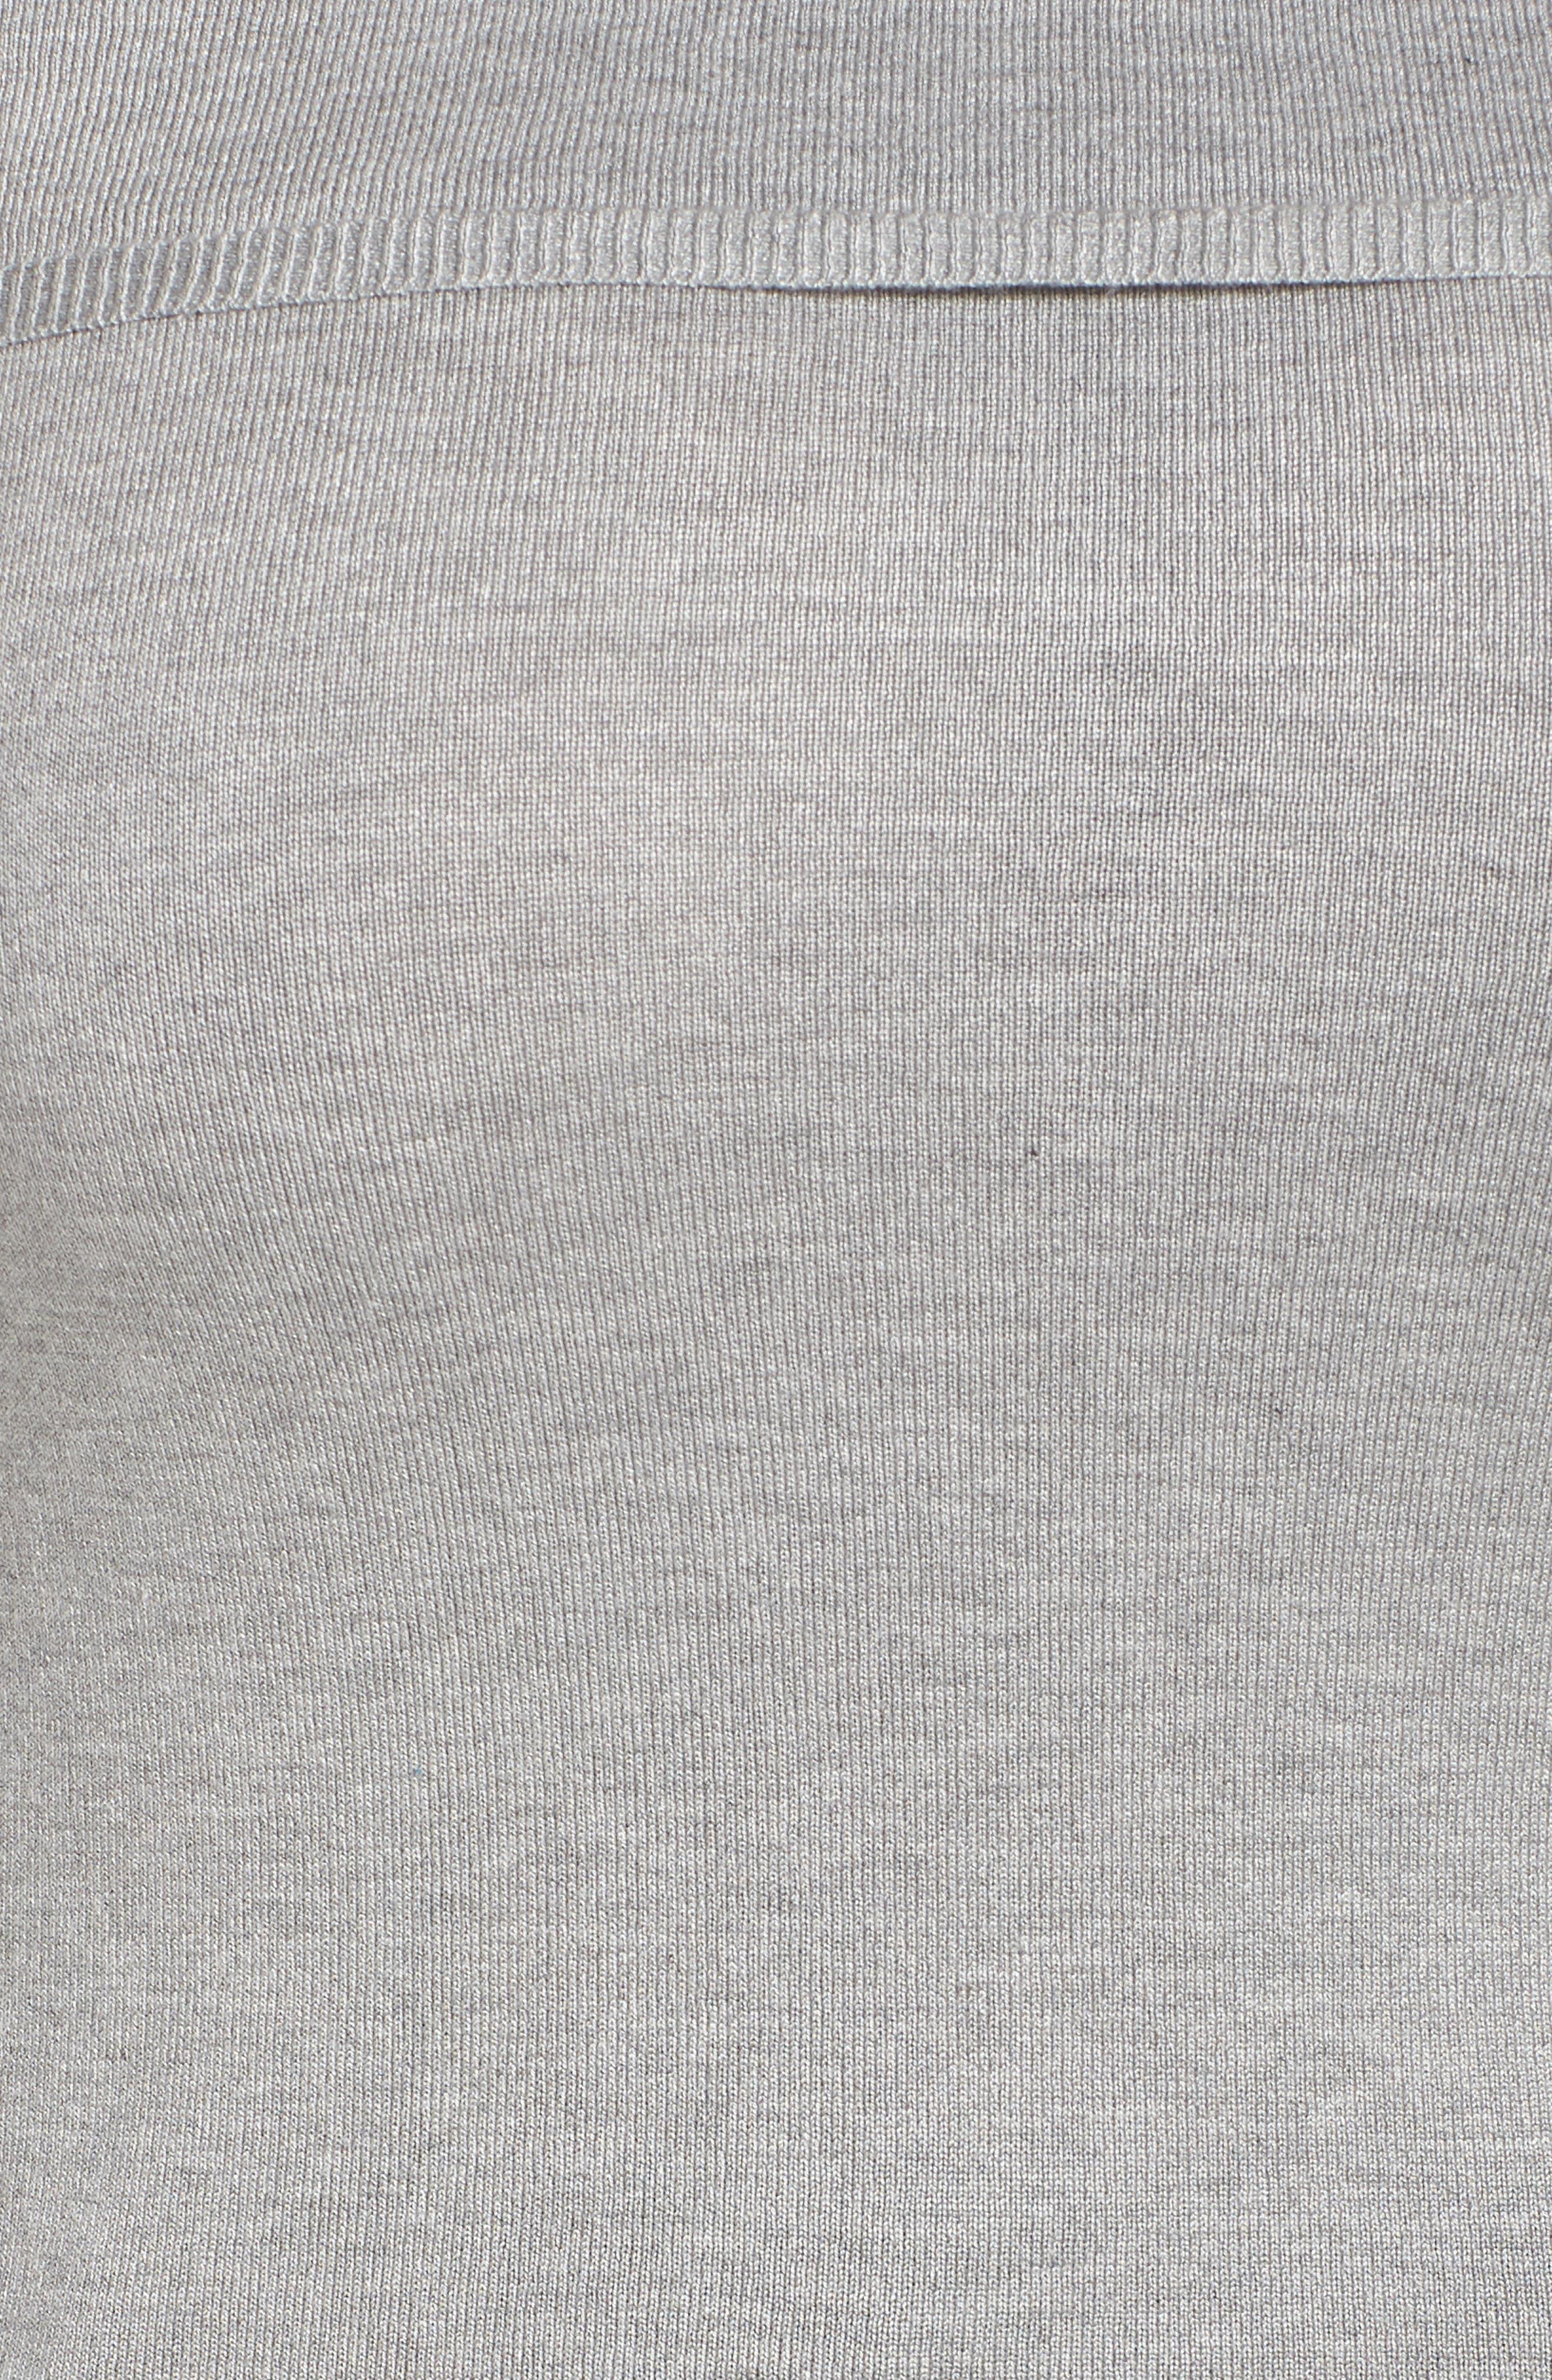 Cold Shoulder Sweater,                             Alternate thumbnail 5, color,                             020